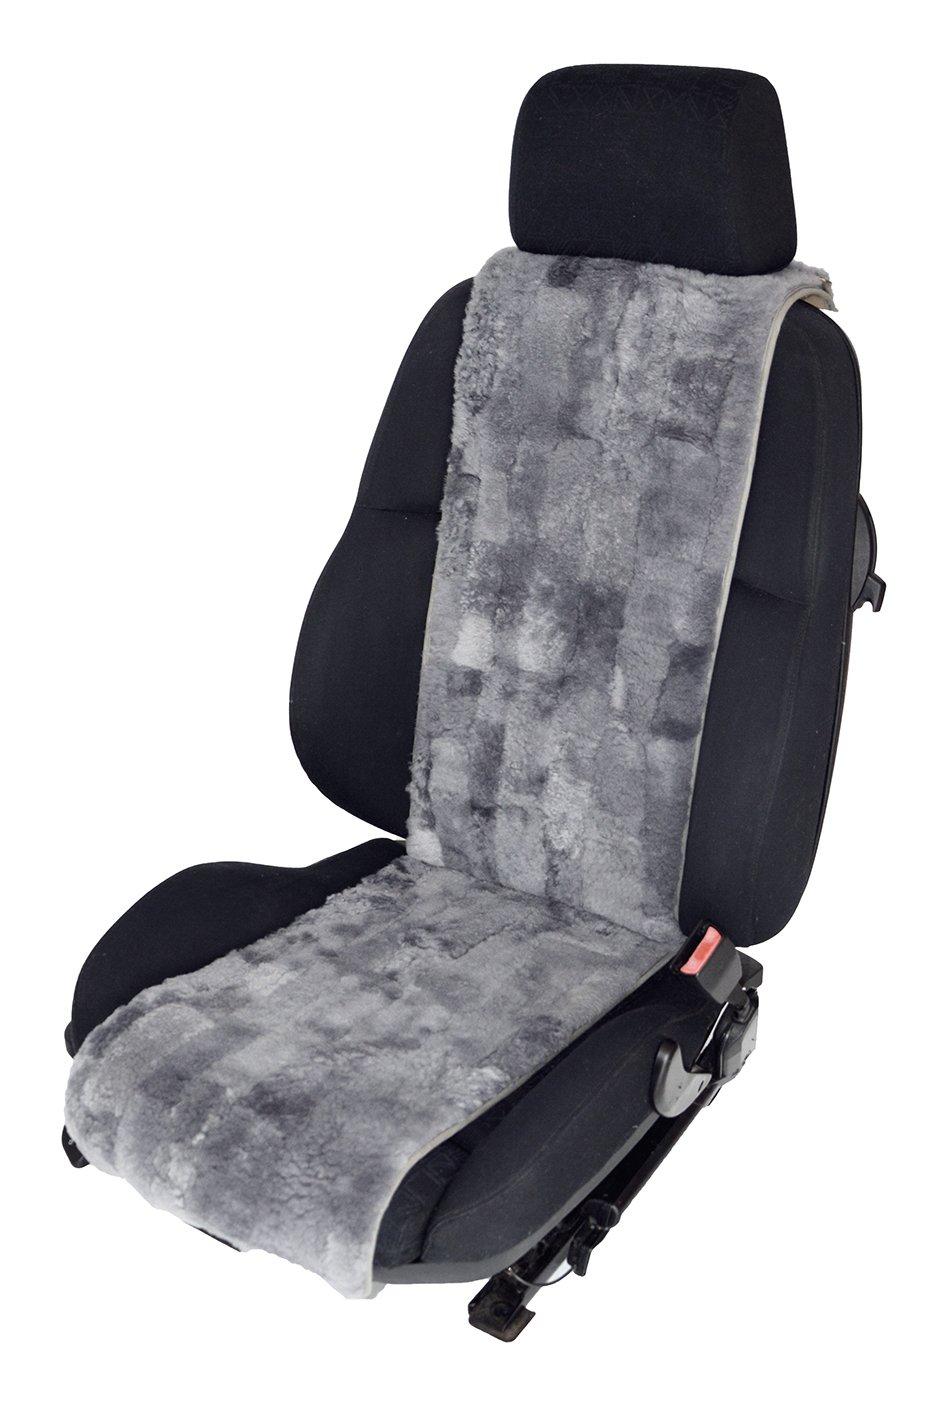 Fellh/öhe 20mm Sekt Leibersperger Autofell-Autositzauflage aus Echtem Lammfell Patchwork 36cm Breite x138cm L/änge